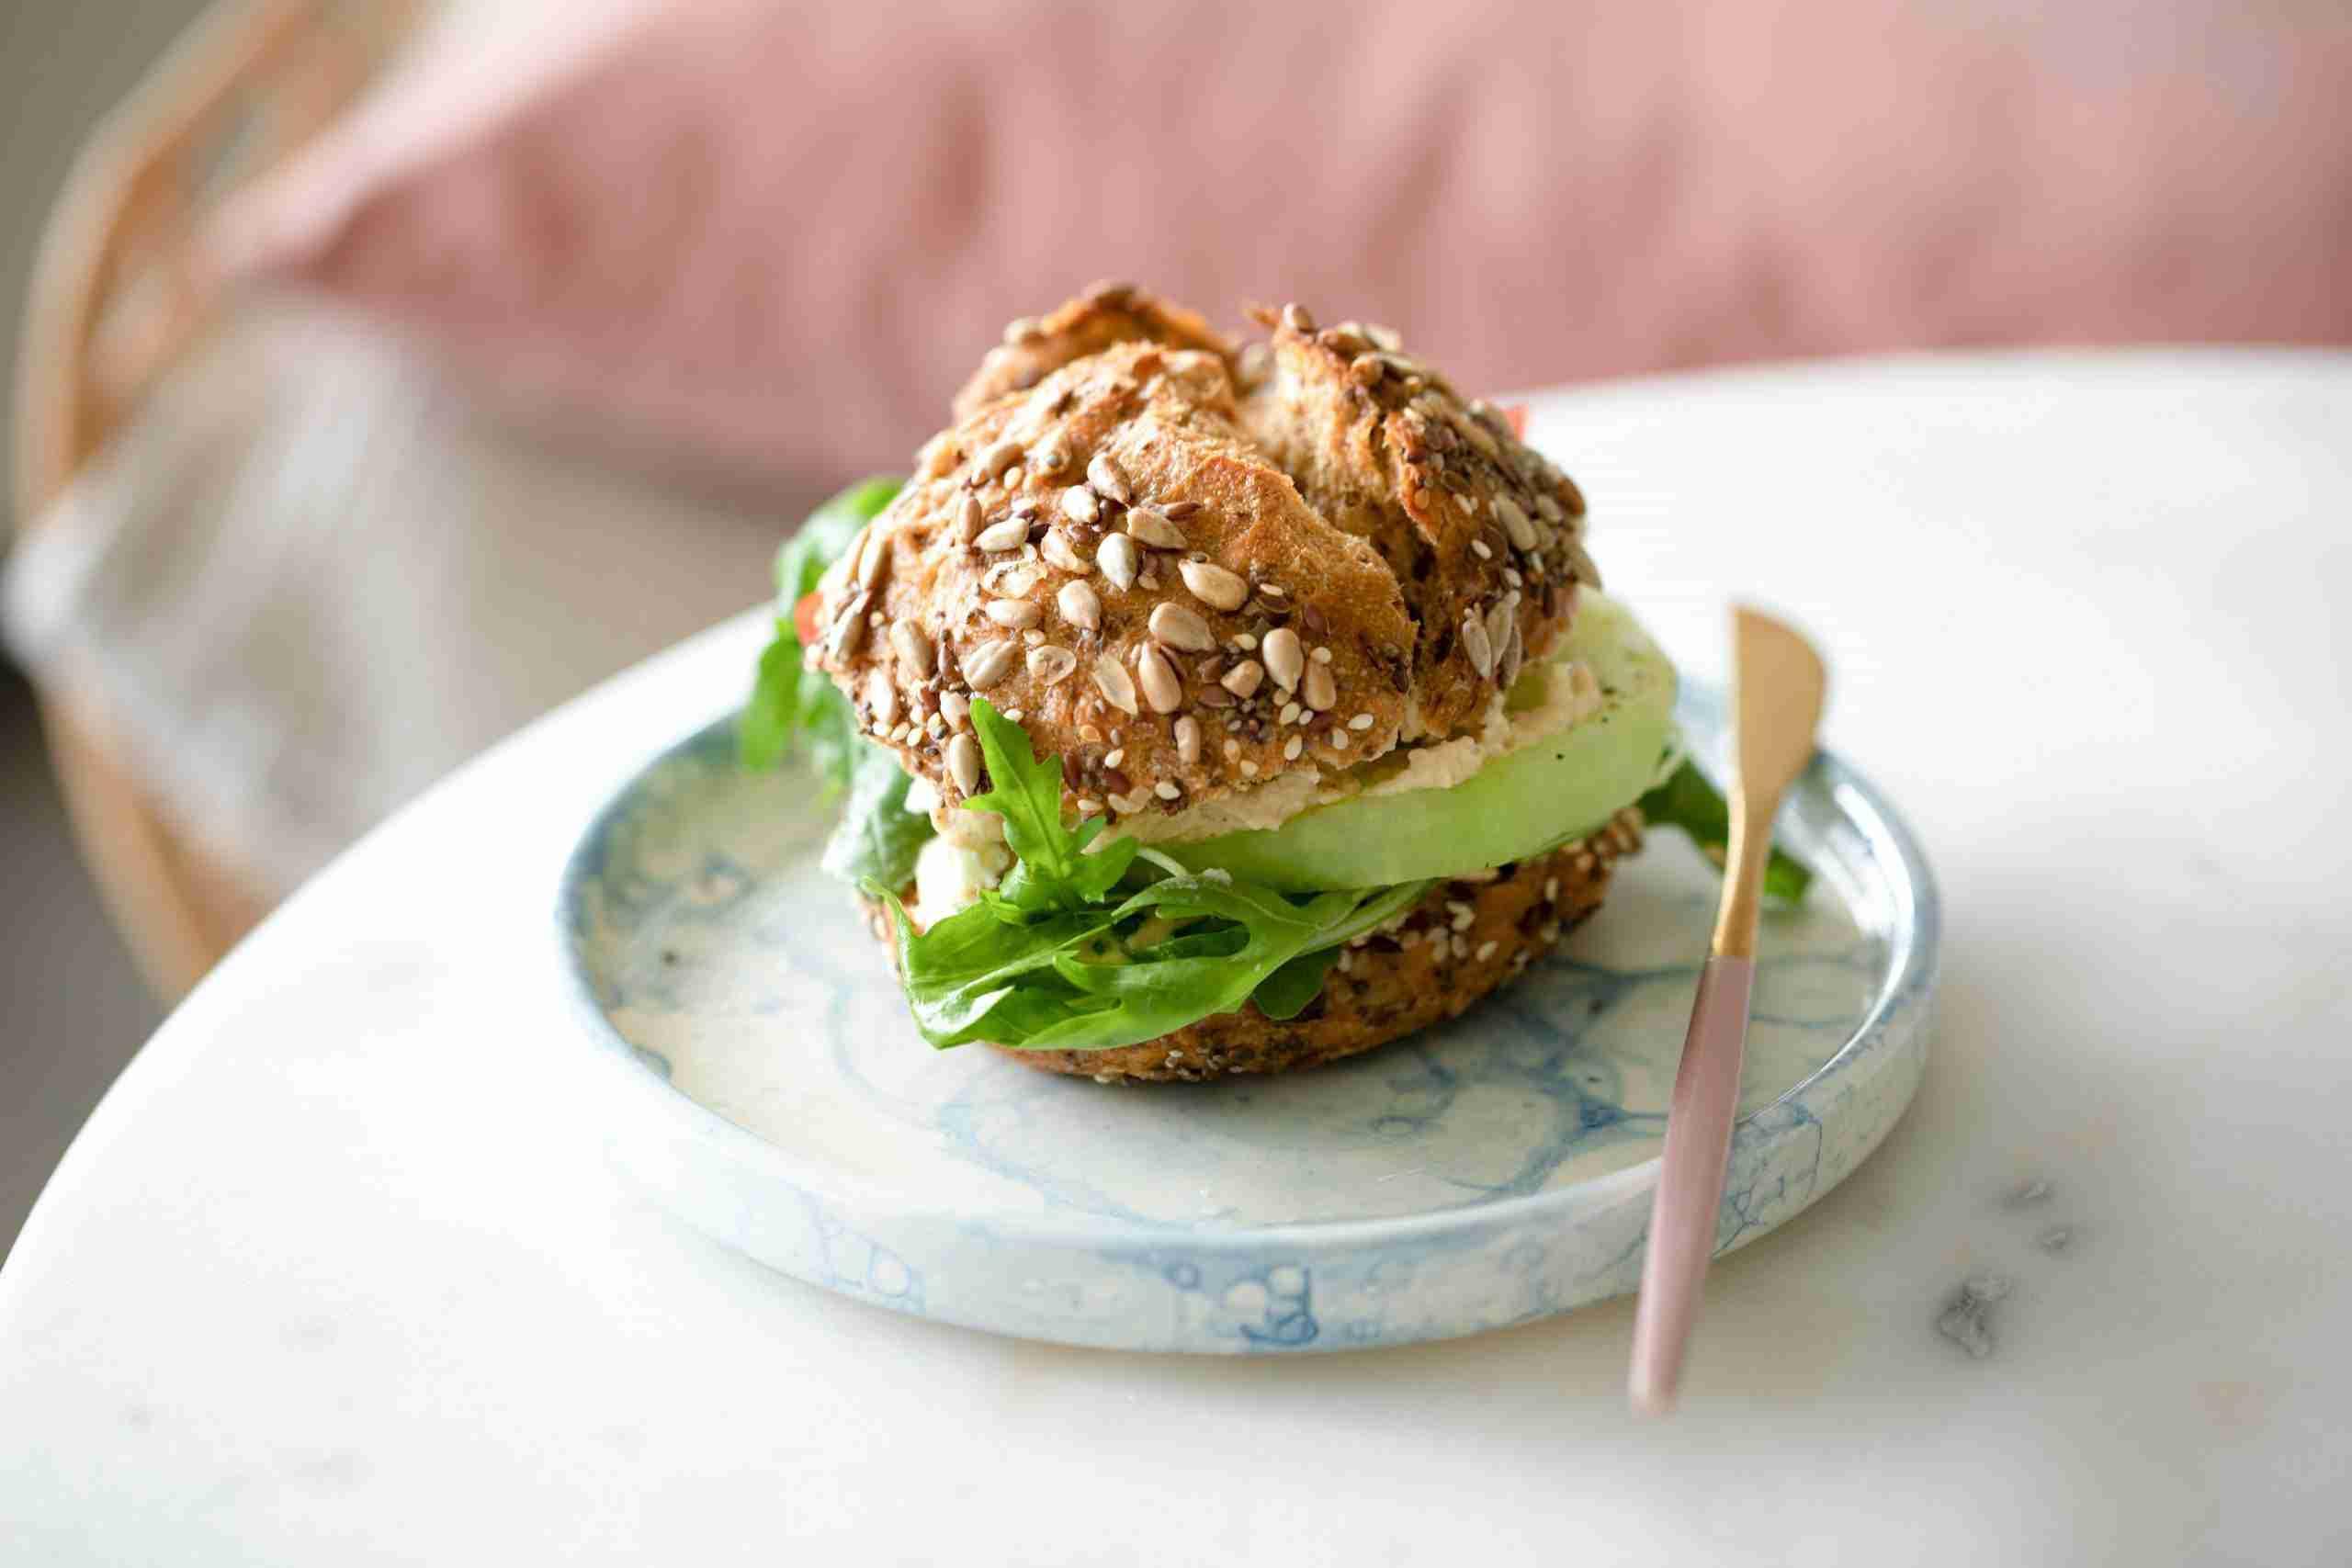 Sandwich on a whole grain seeded bun with lettuce and avocado.